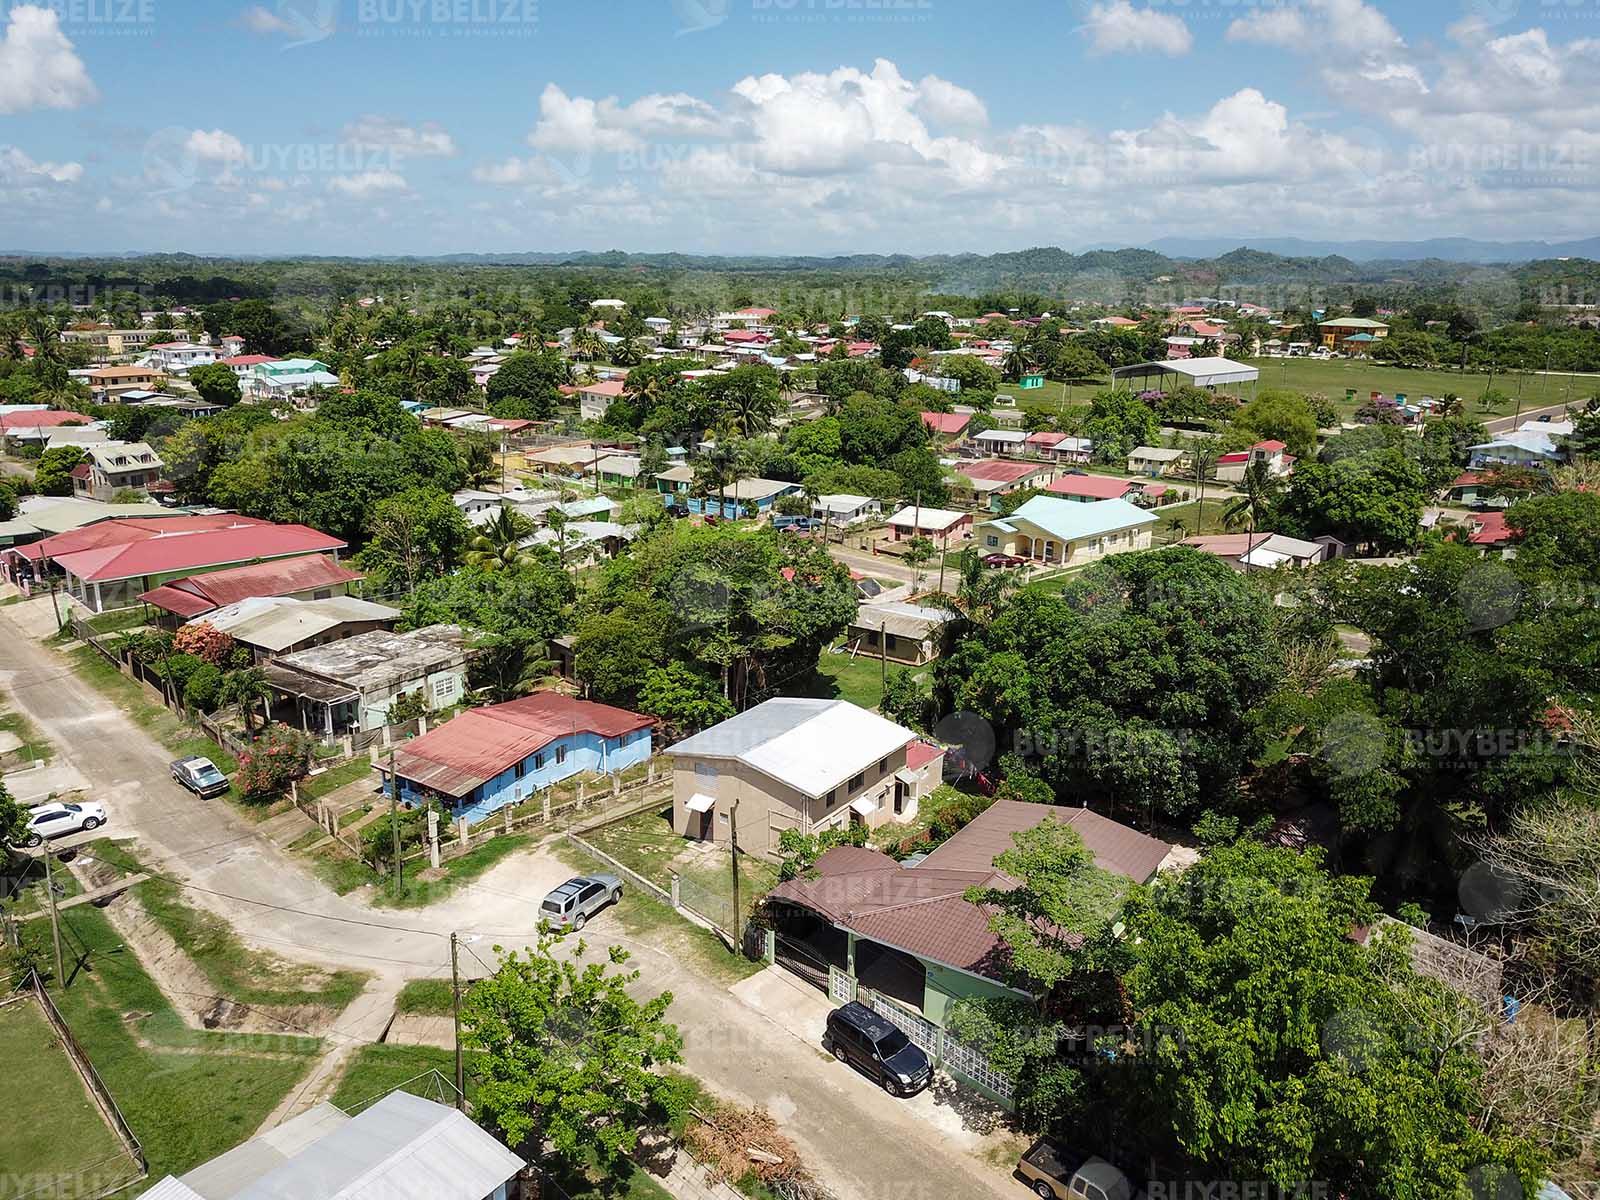 5 Bed 3 Bath Split Unit House for Sale in Belmopan City